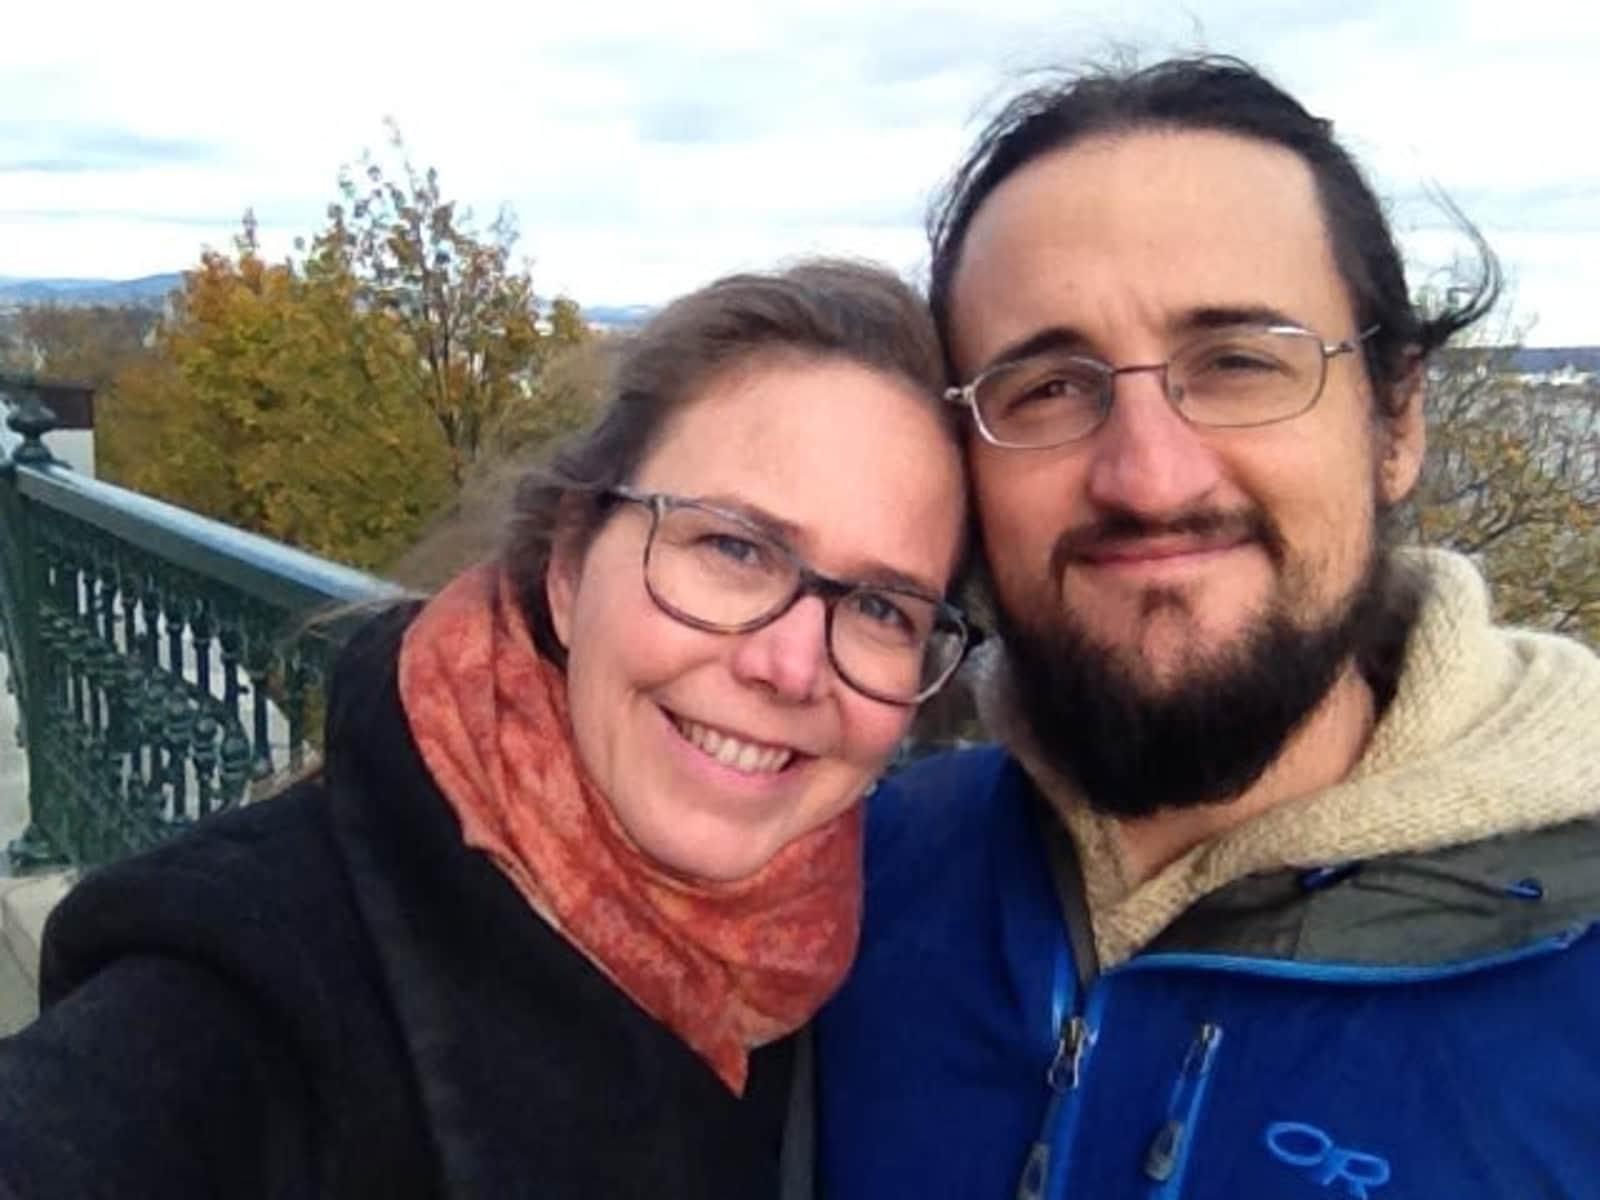 Deborah & Owen from Victoria, British Columbia, Canada